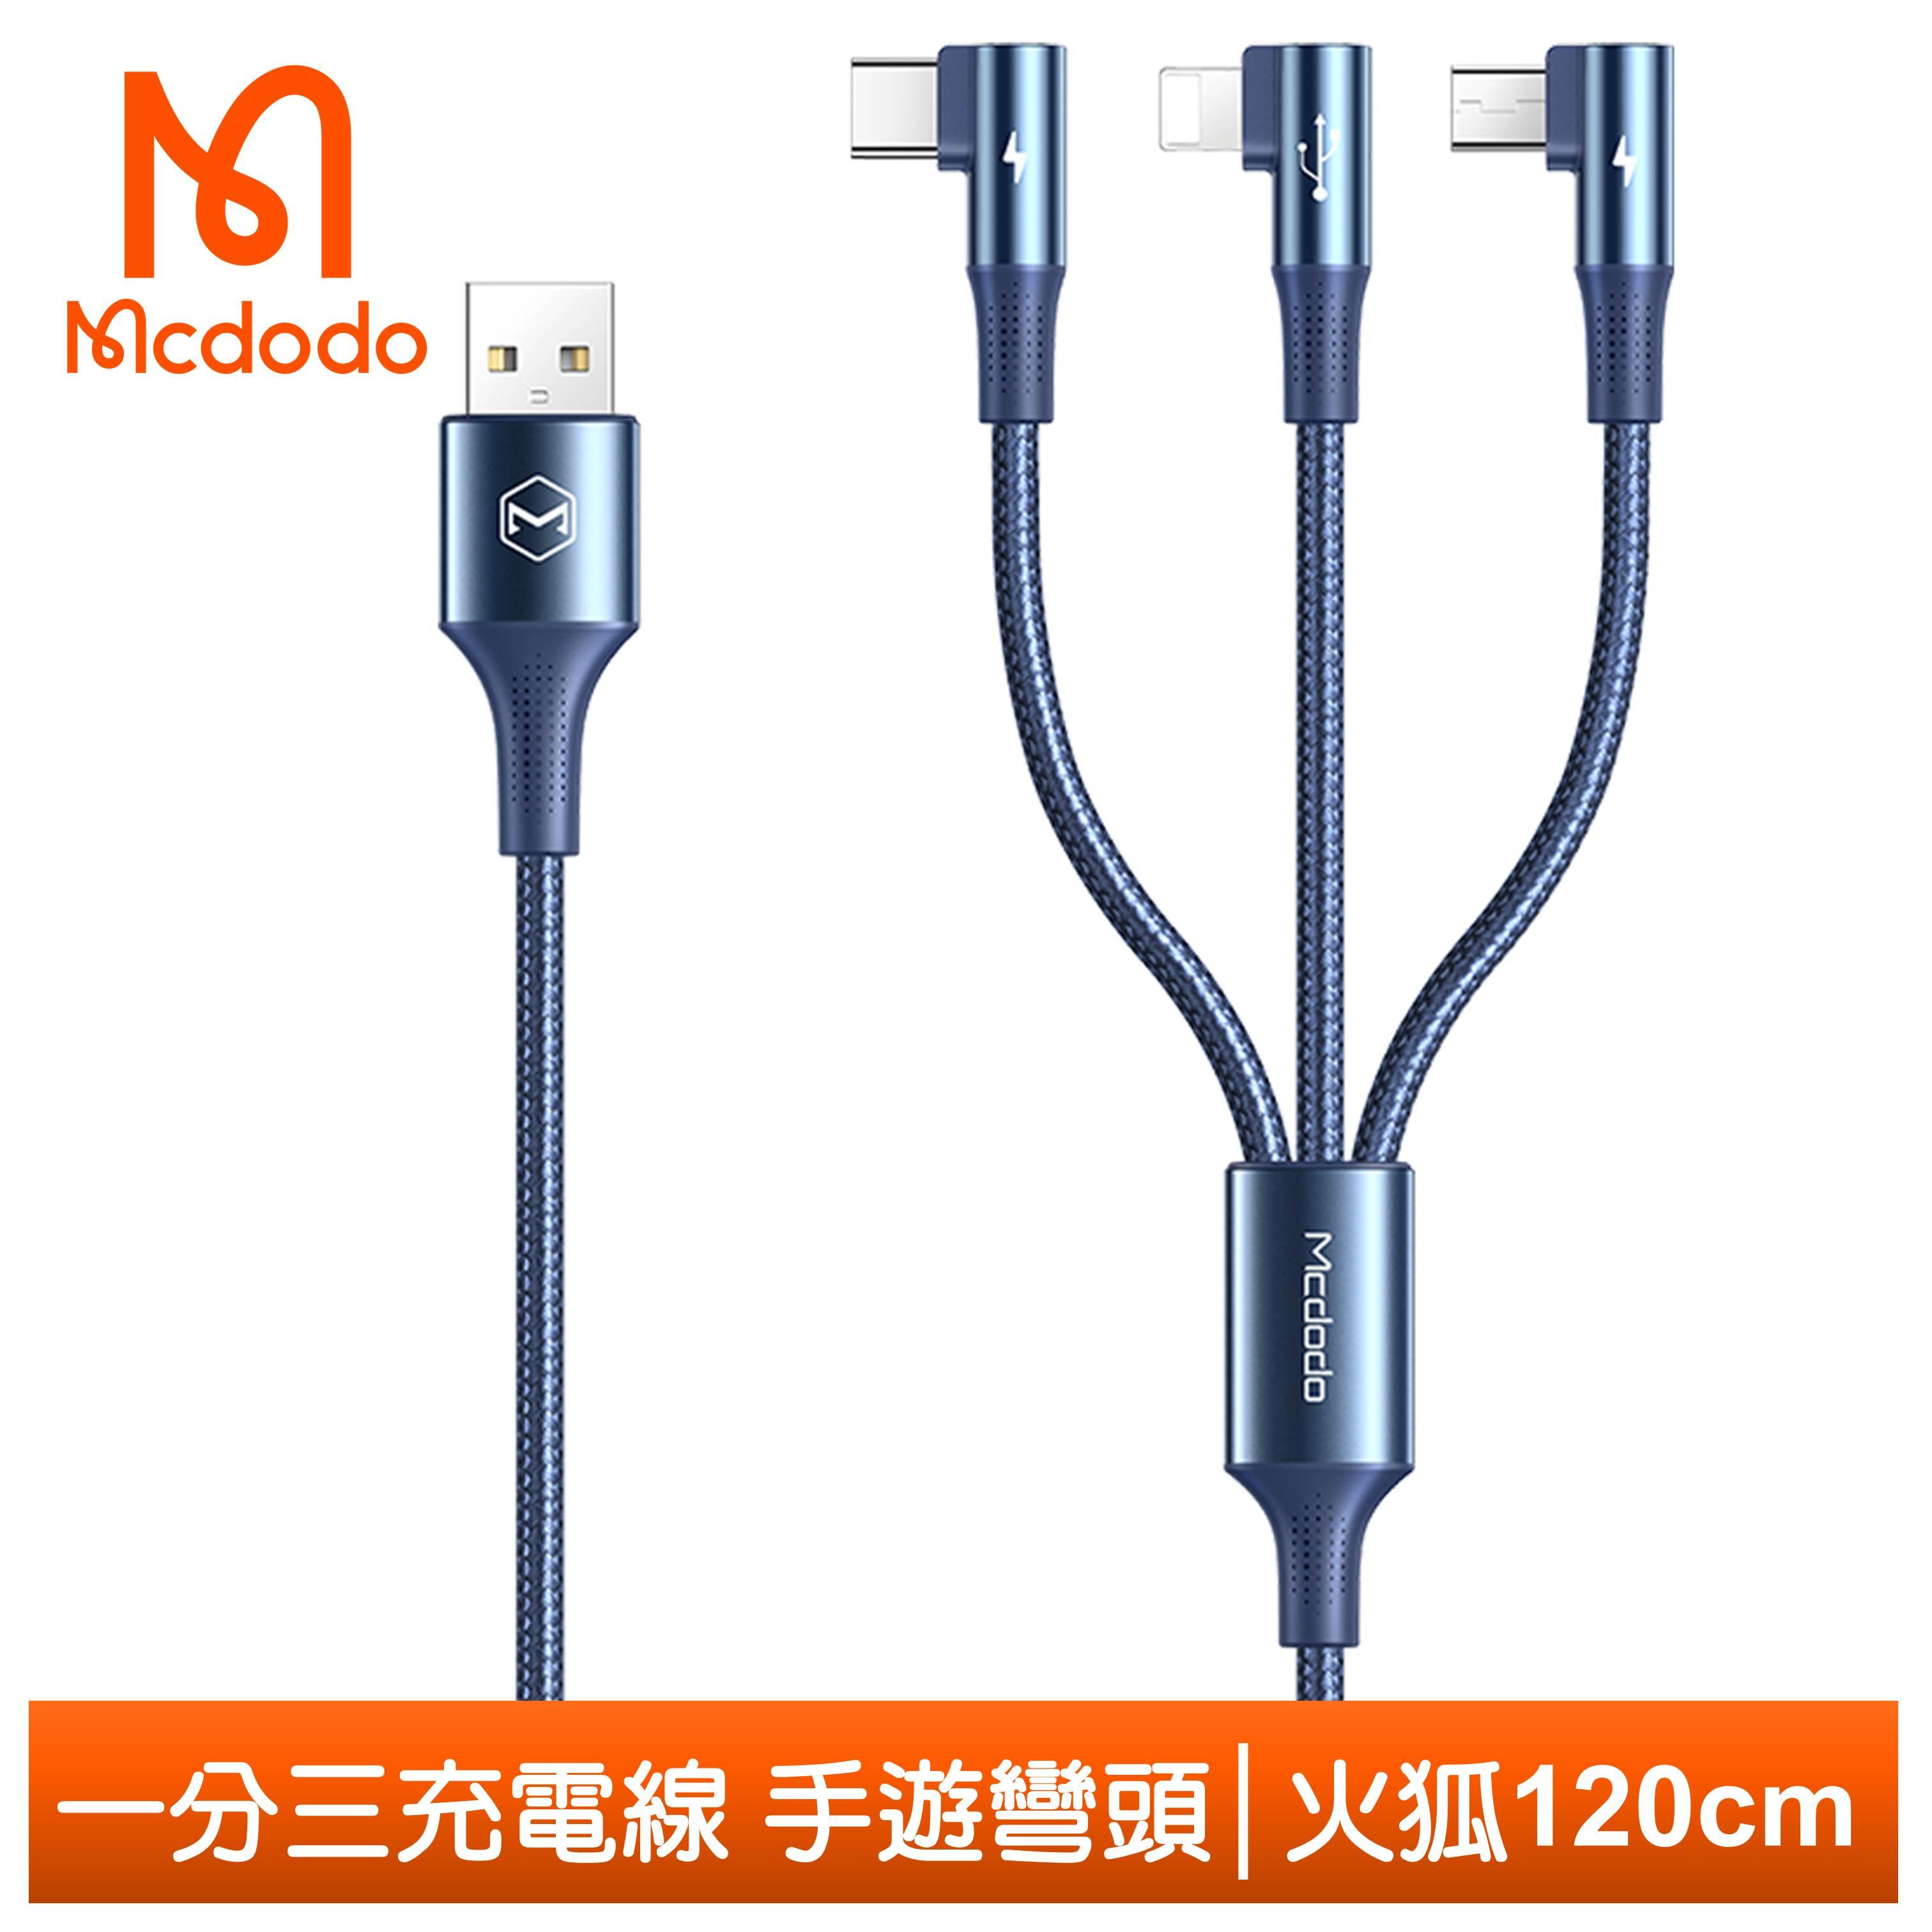 Mcdodo麥多多台灣官方 一分三 Lightning/TypeC/安卓MicroUSB/iPhone充電線傳輸線 手遊彎頭 火狐 1.2M 藍色